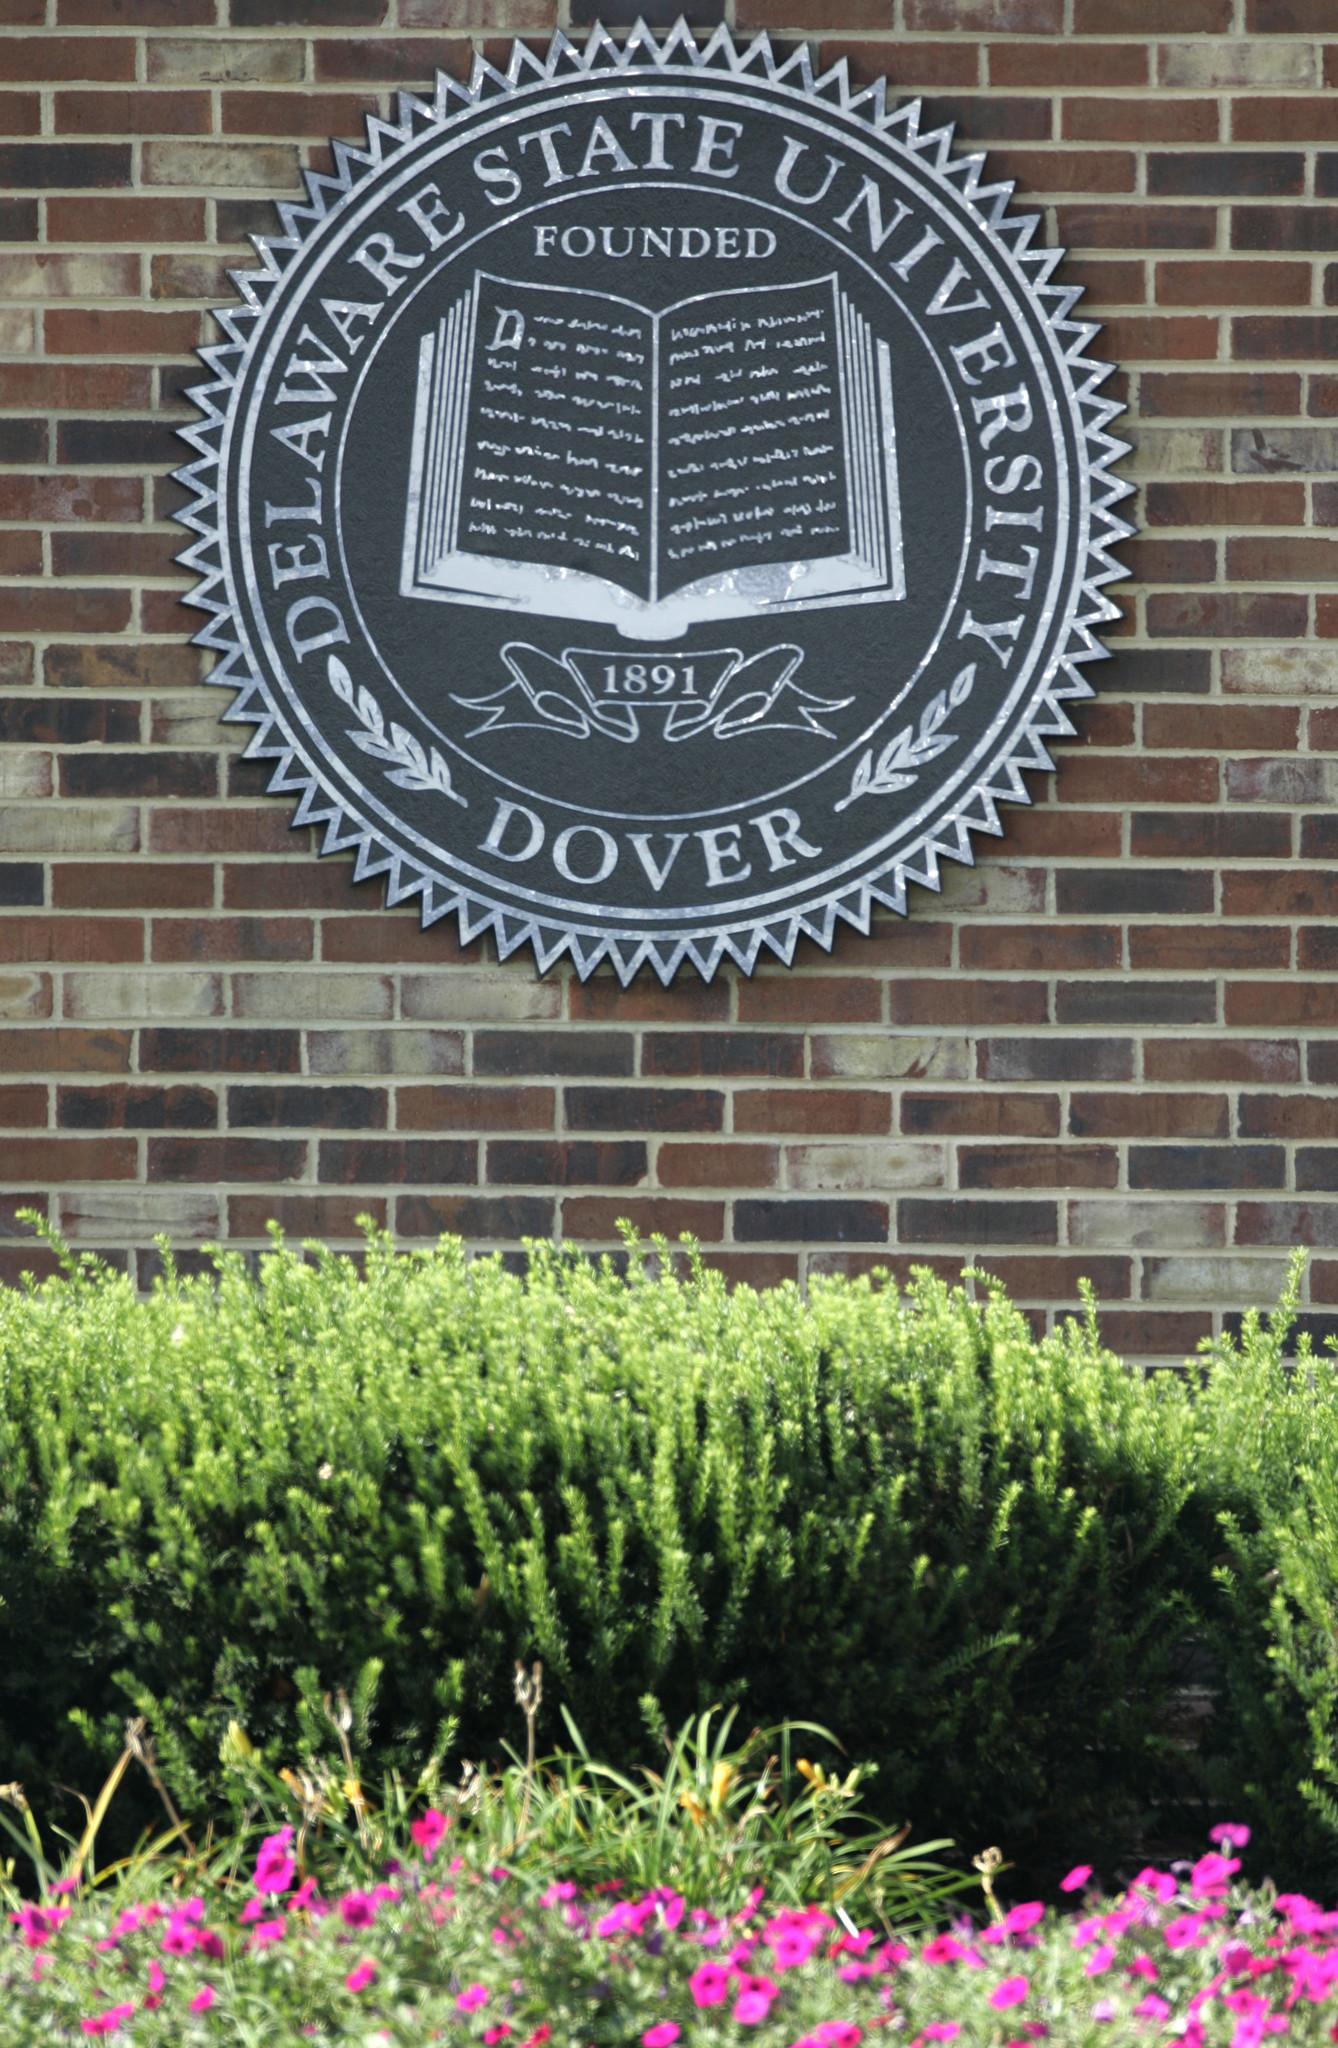 Officials: 3 shot, injured at Delaware State University cookout